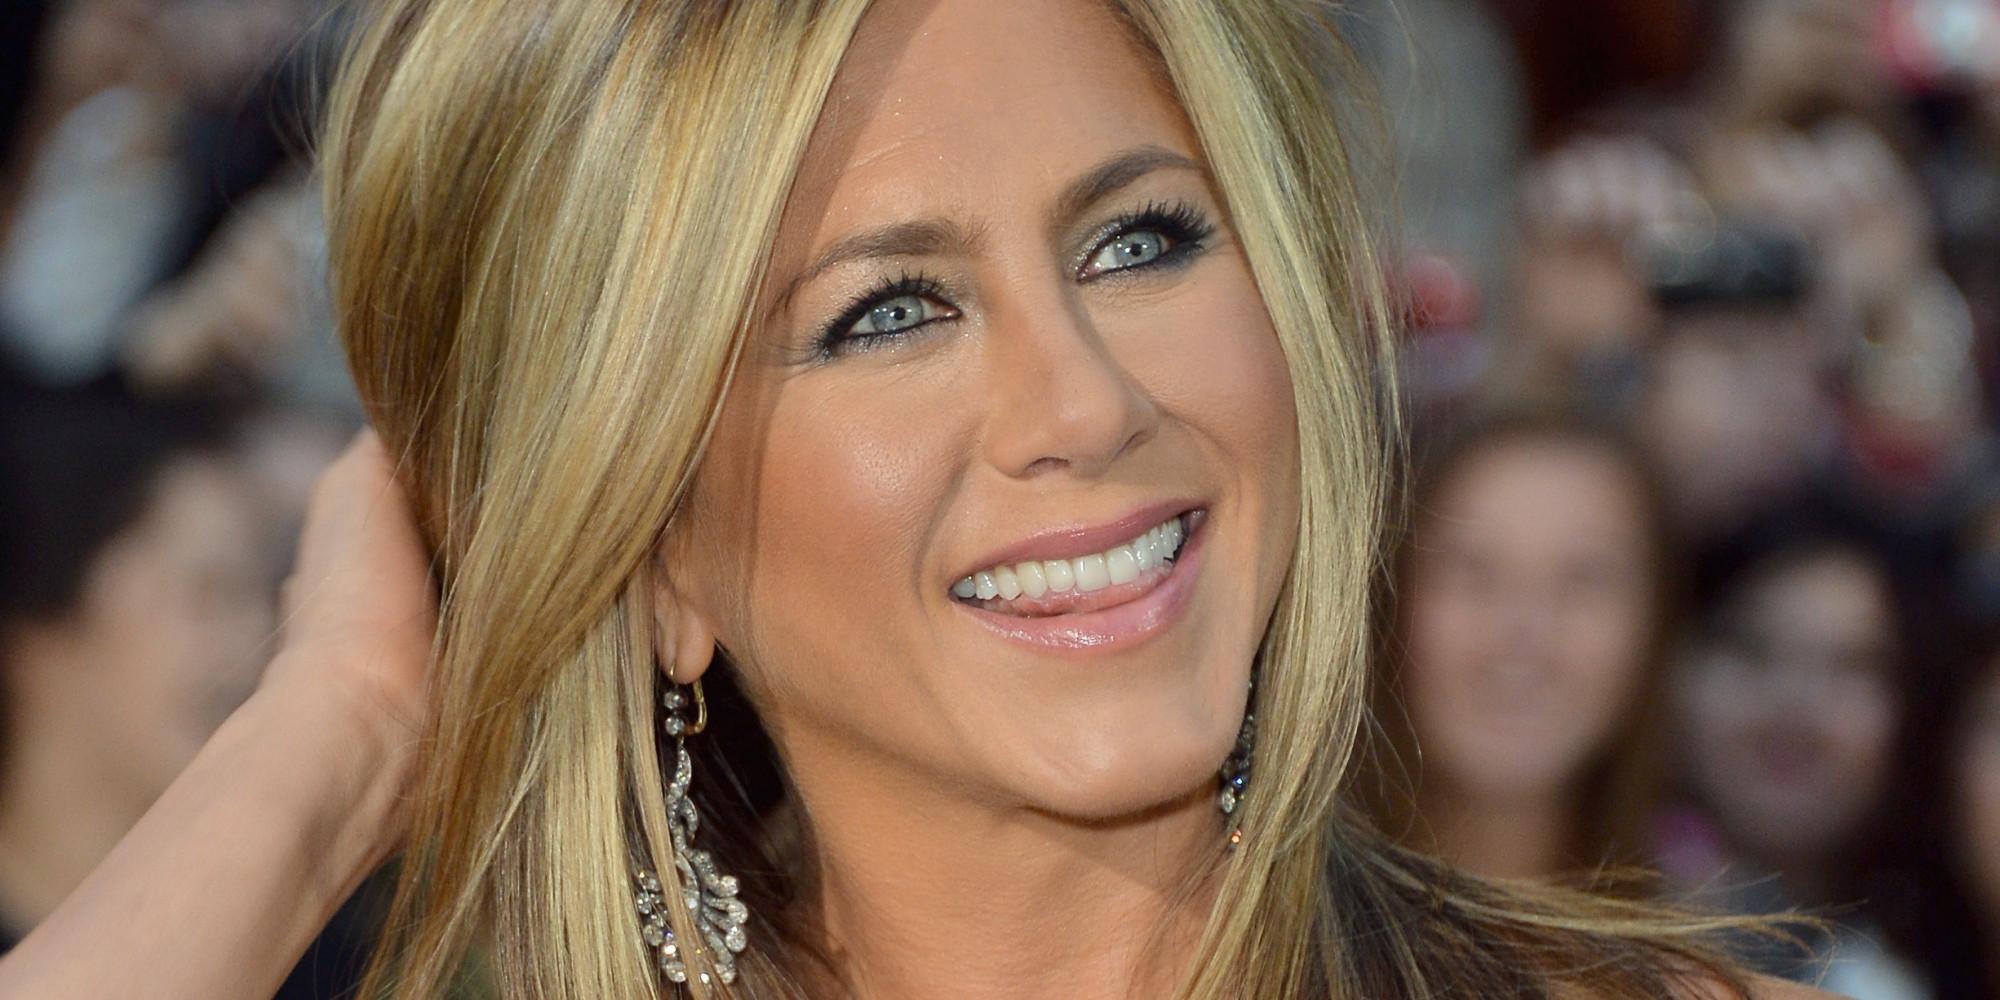 Rolex wearer Jennifer Aniston supports husband at Critics' Choice Awards